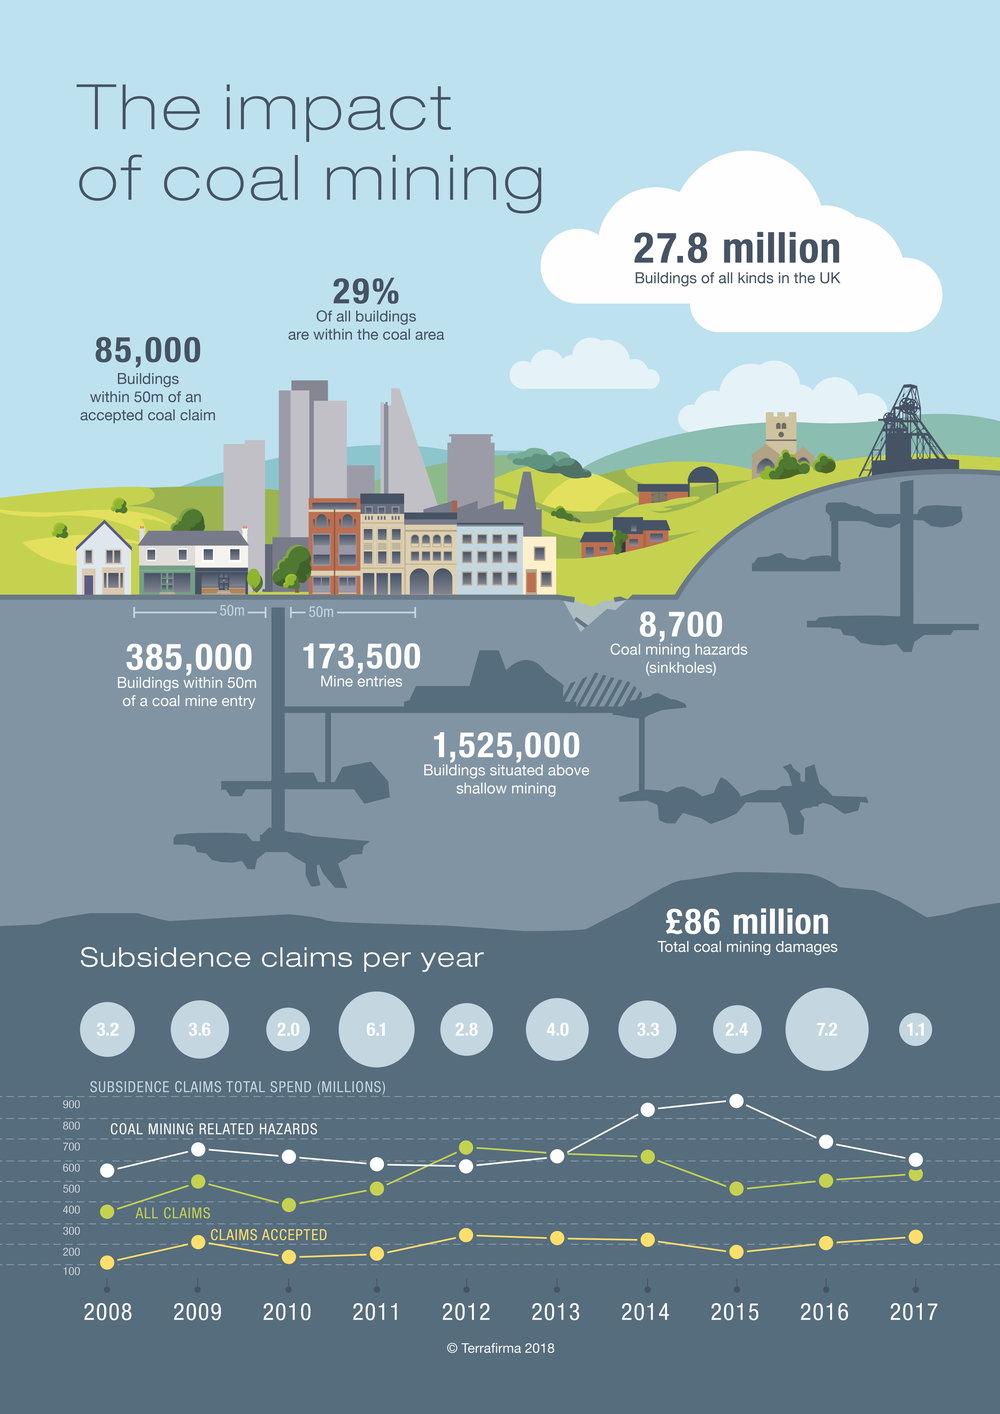 Impact of Coal Mining (Infographic (C) Terrafirma 2018)